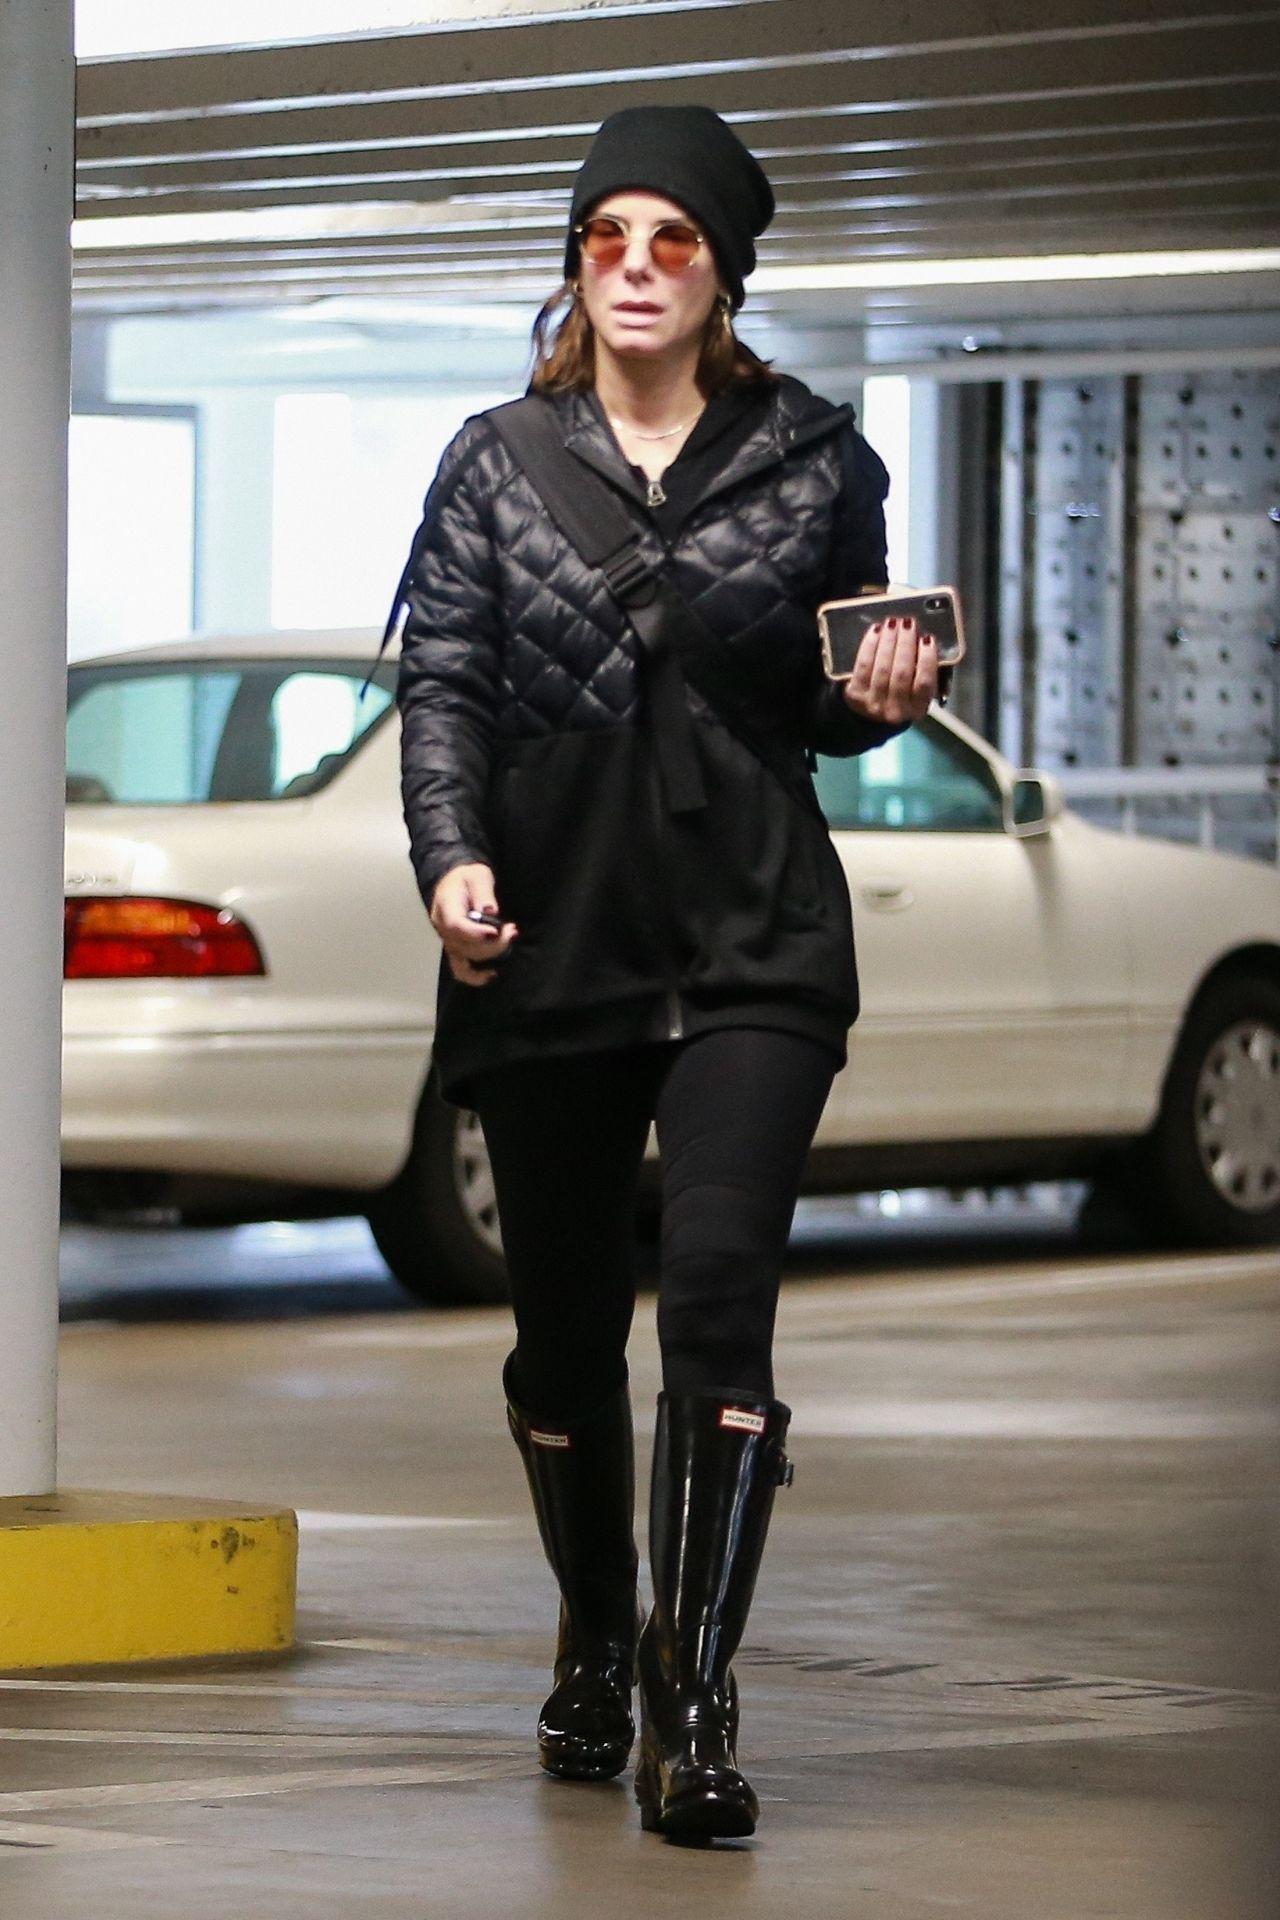 Umur 56 Tahun, Simak OOTD Awet Muda Sandra Bullock